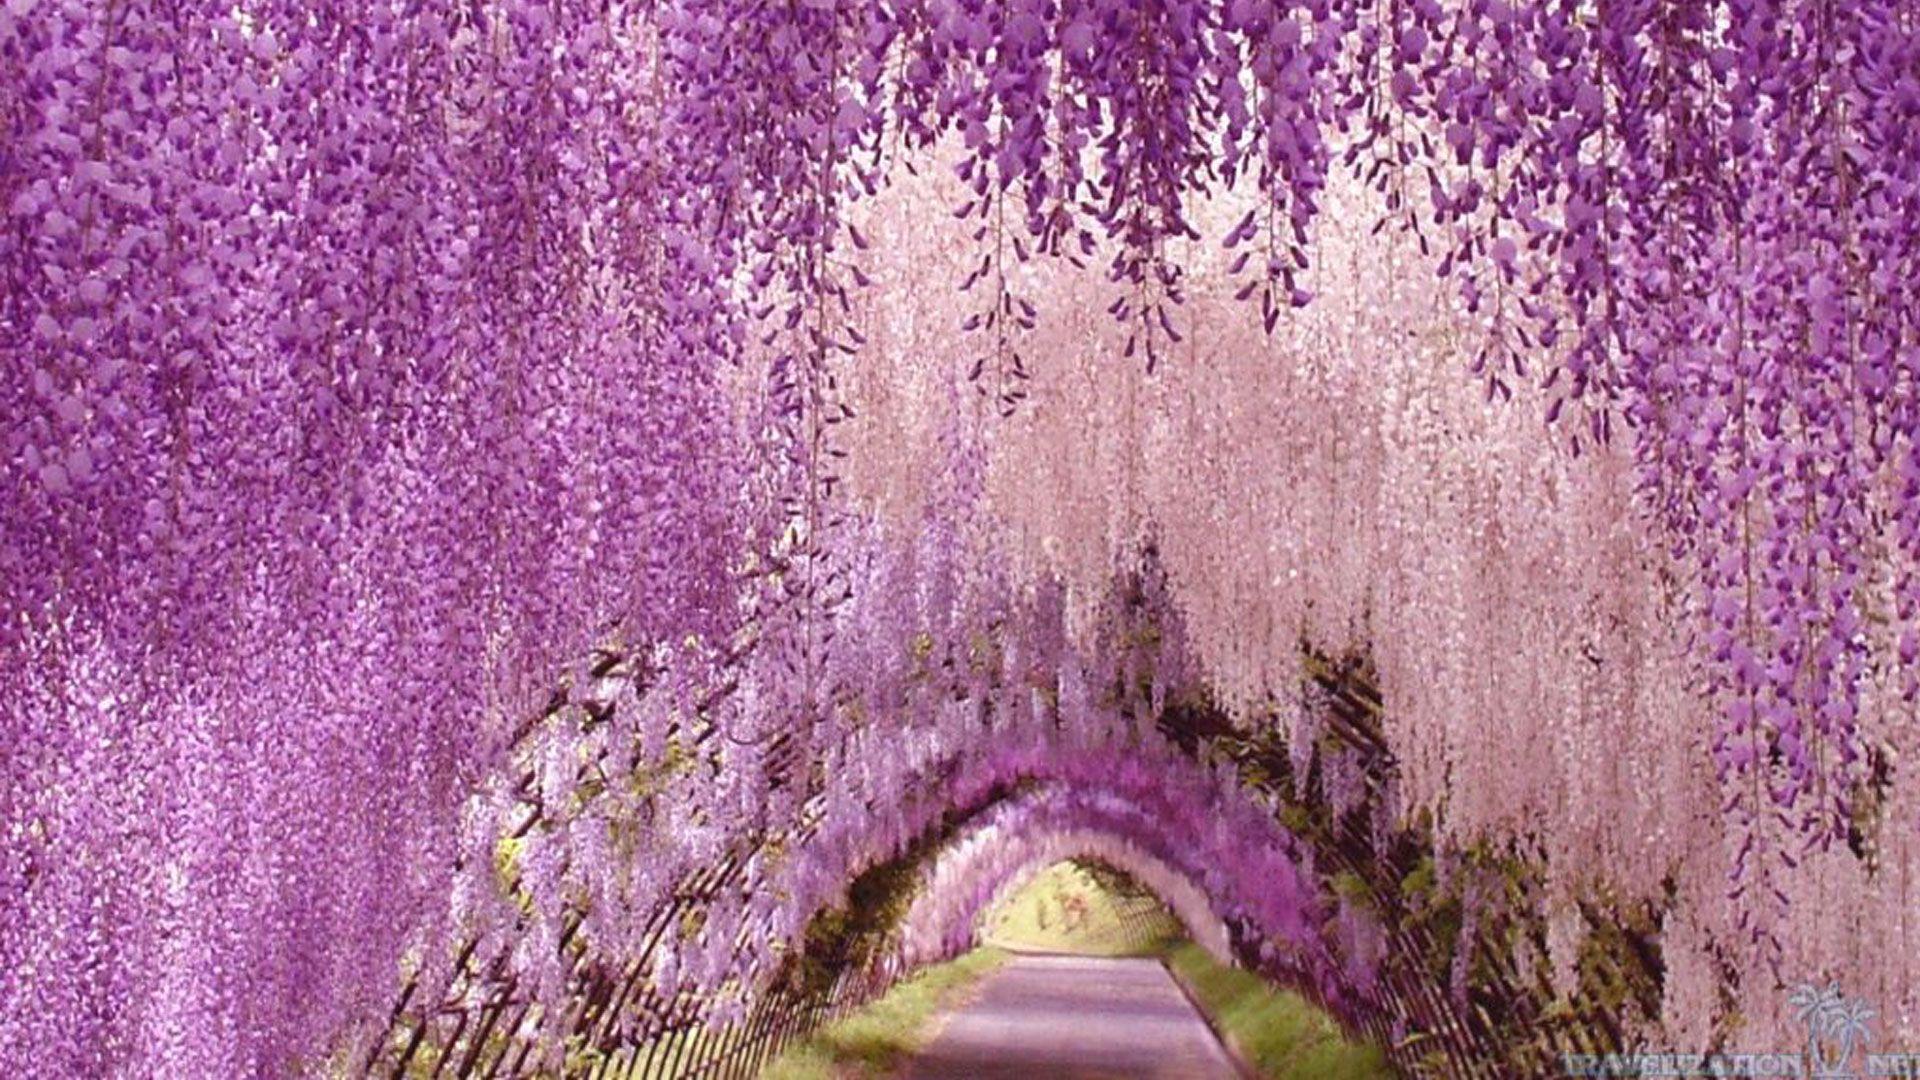 Glycine Kawashifuji Kyushu Japon Jardin Japonais Photos Voyages